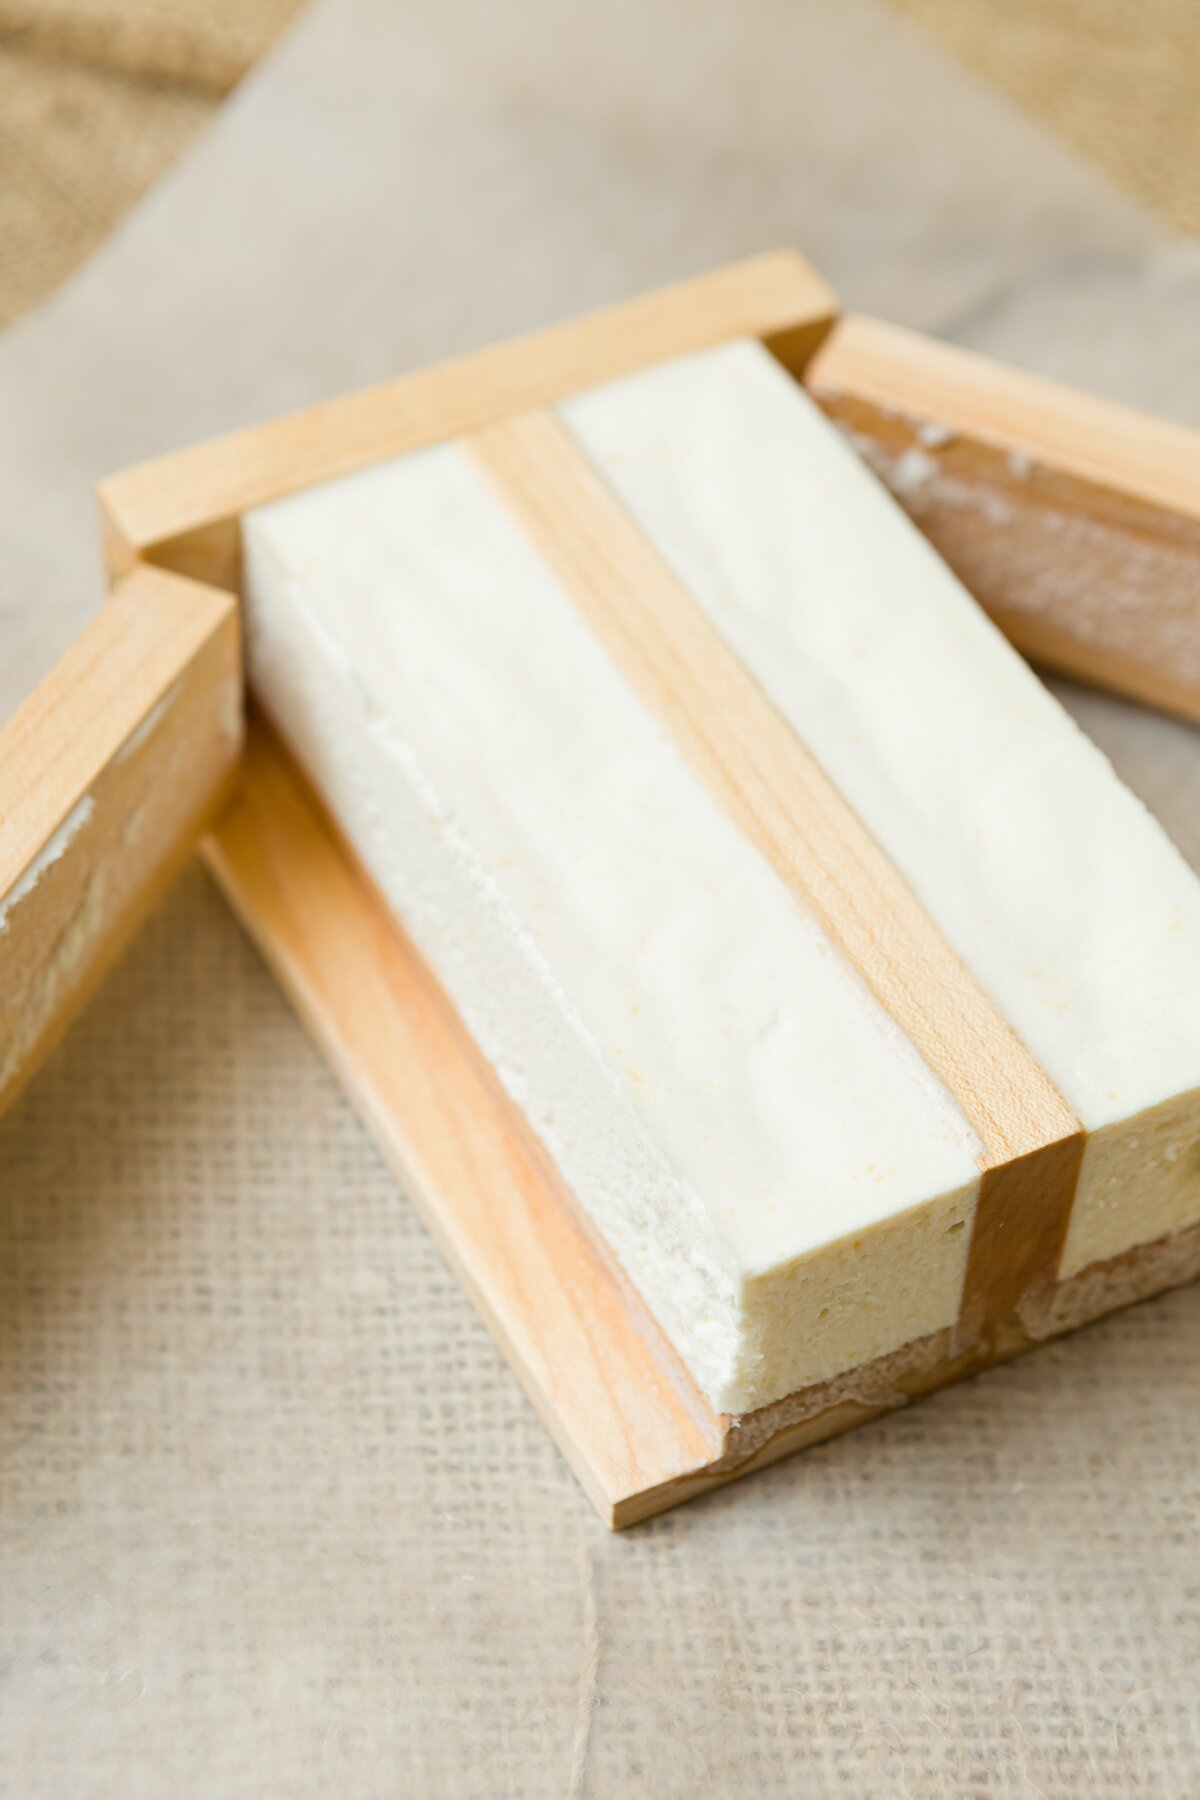 hardened vegan butter in a wooden butter mold